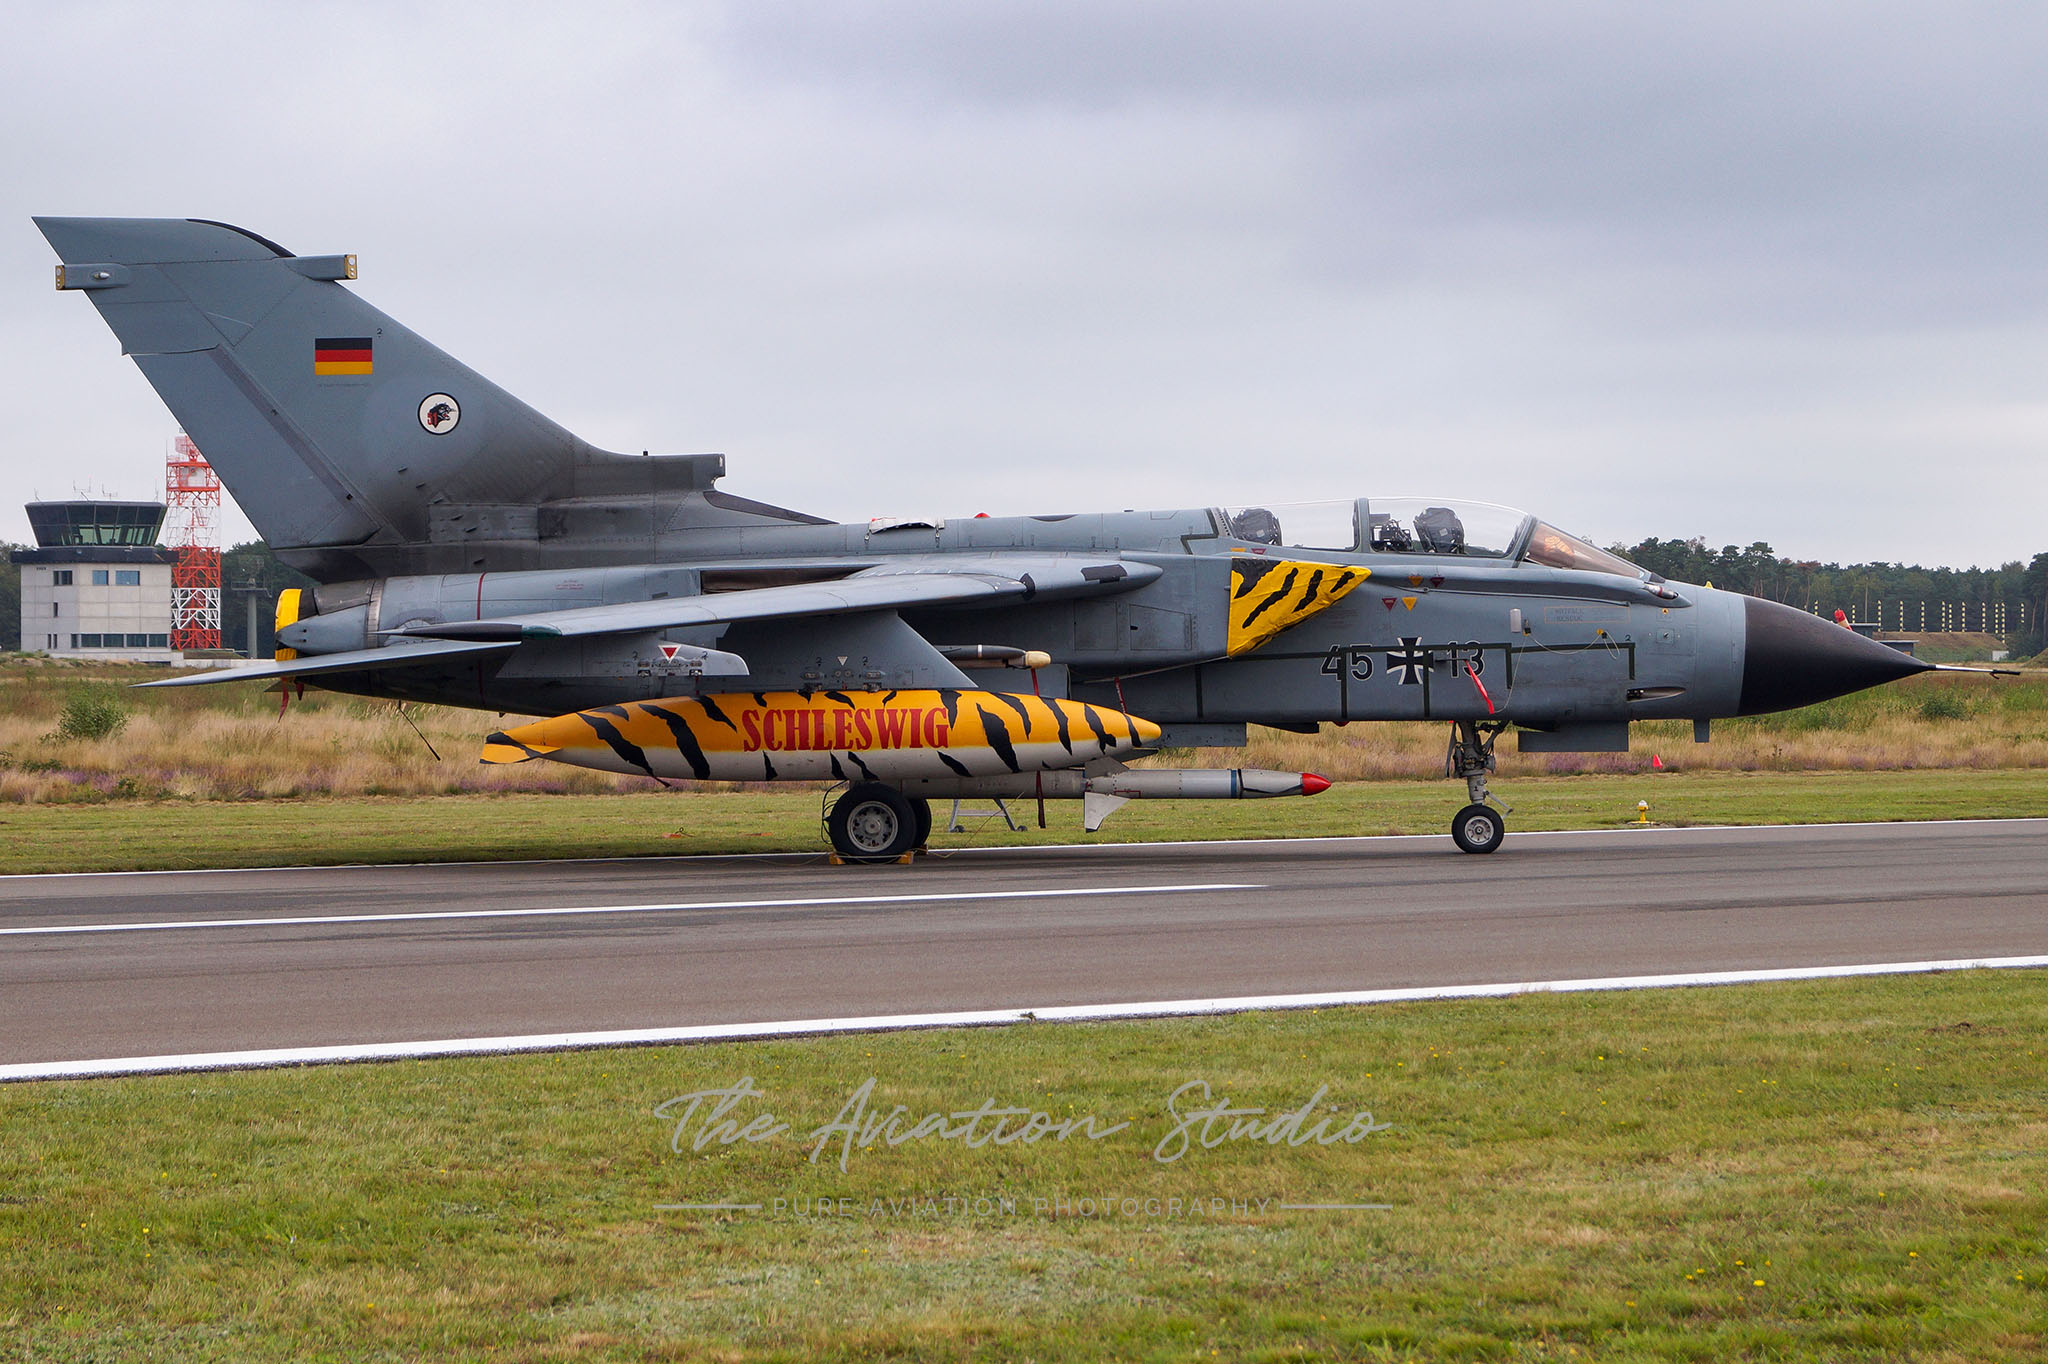 German Air Force Panavia Tornado IDS 45+13 at Spottersday Kleine Brogel 2021